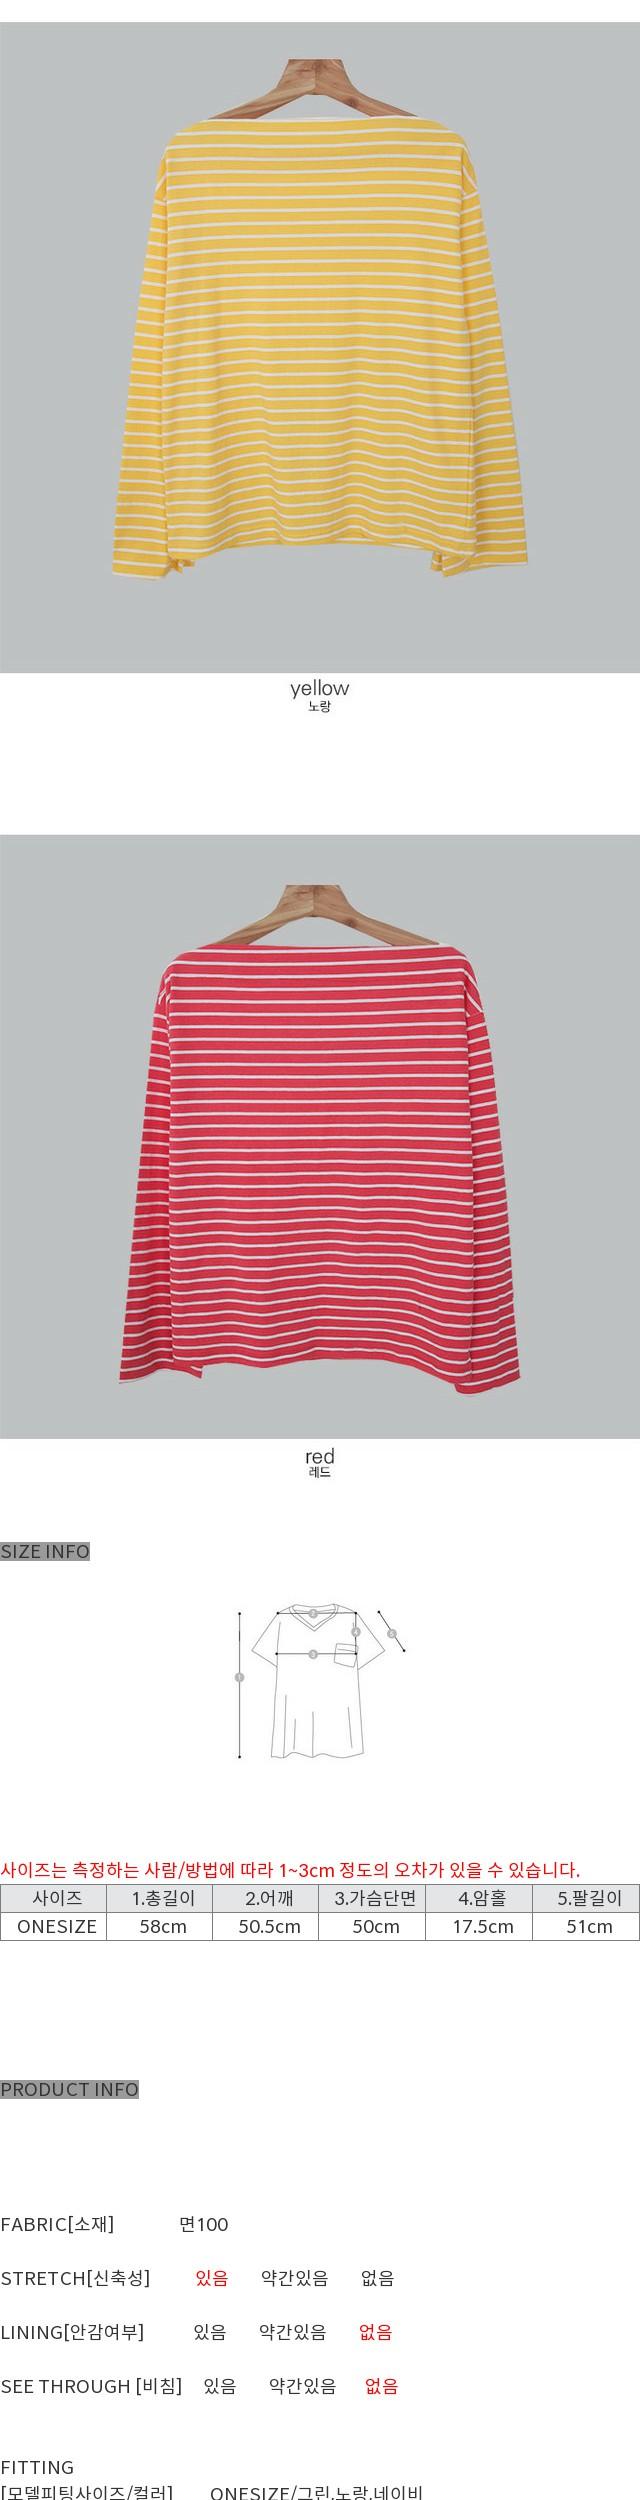 Colorpop-striped tee